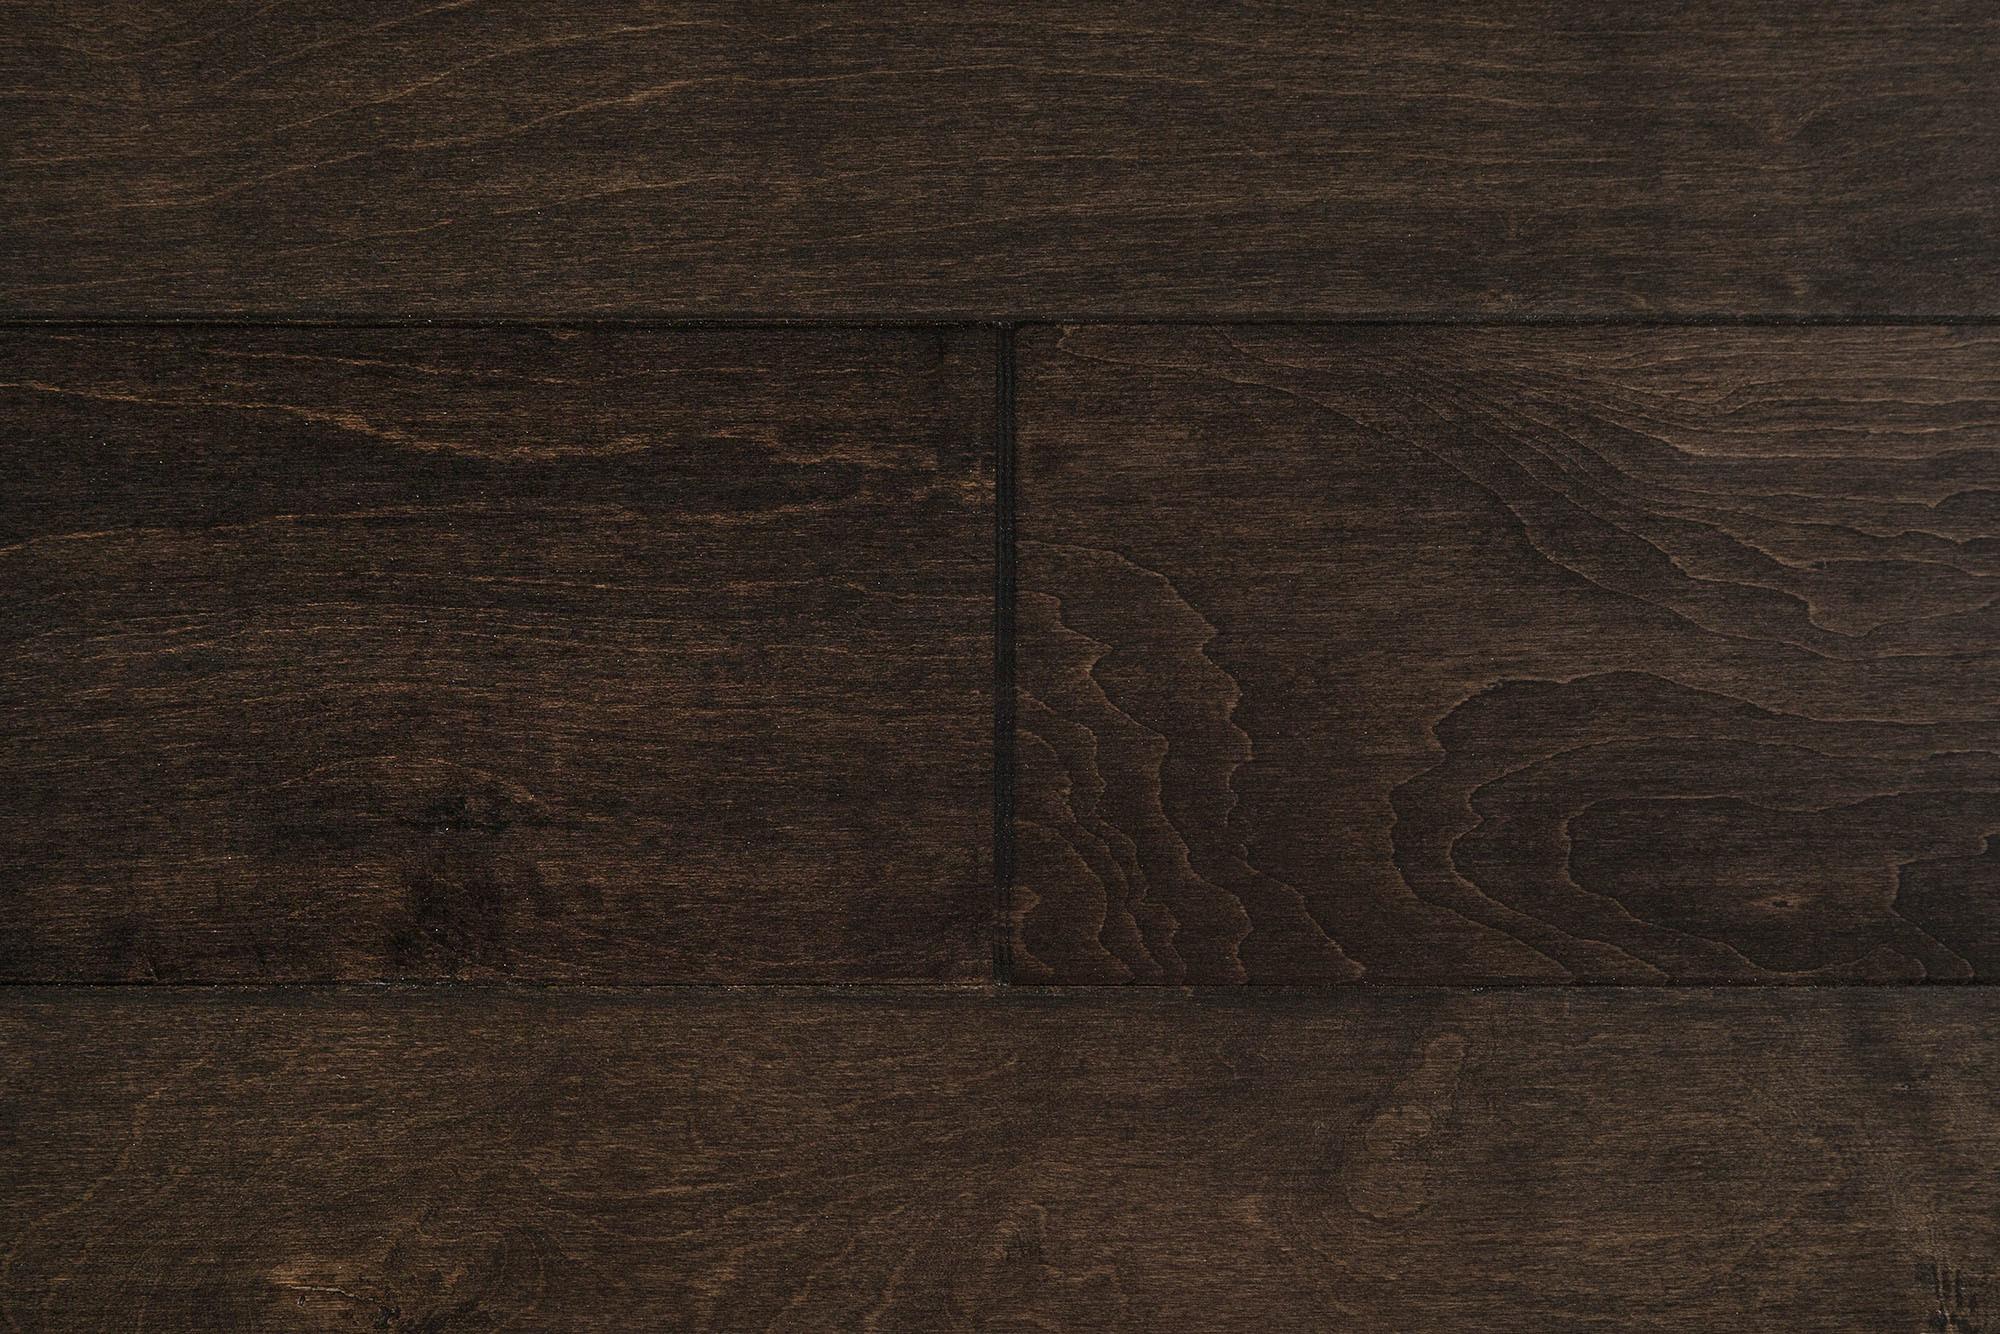 FREE Samples: Jasper Engineered Hardwood - Handscraped Distressed